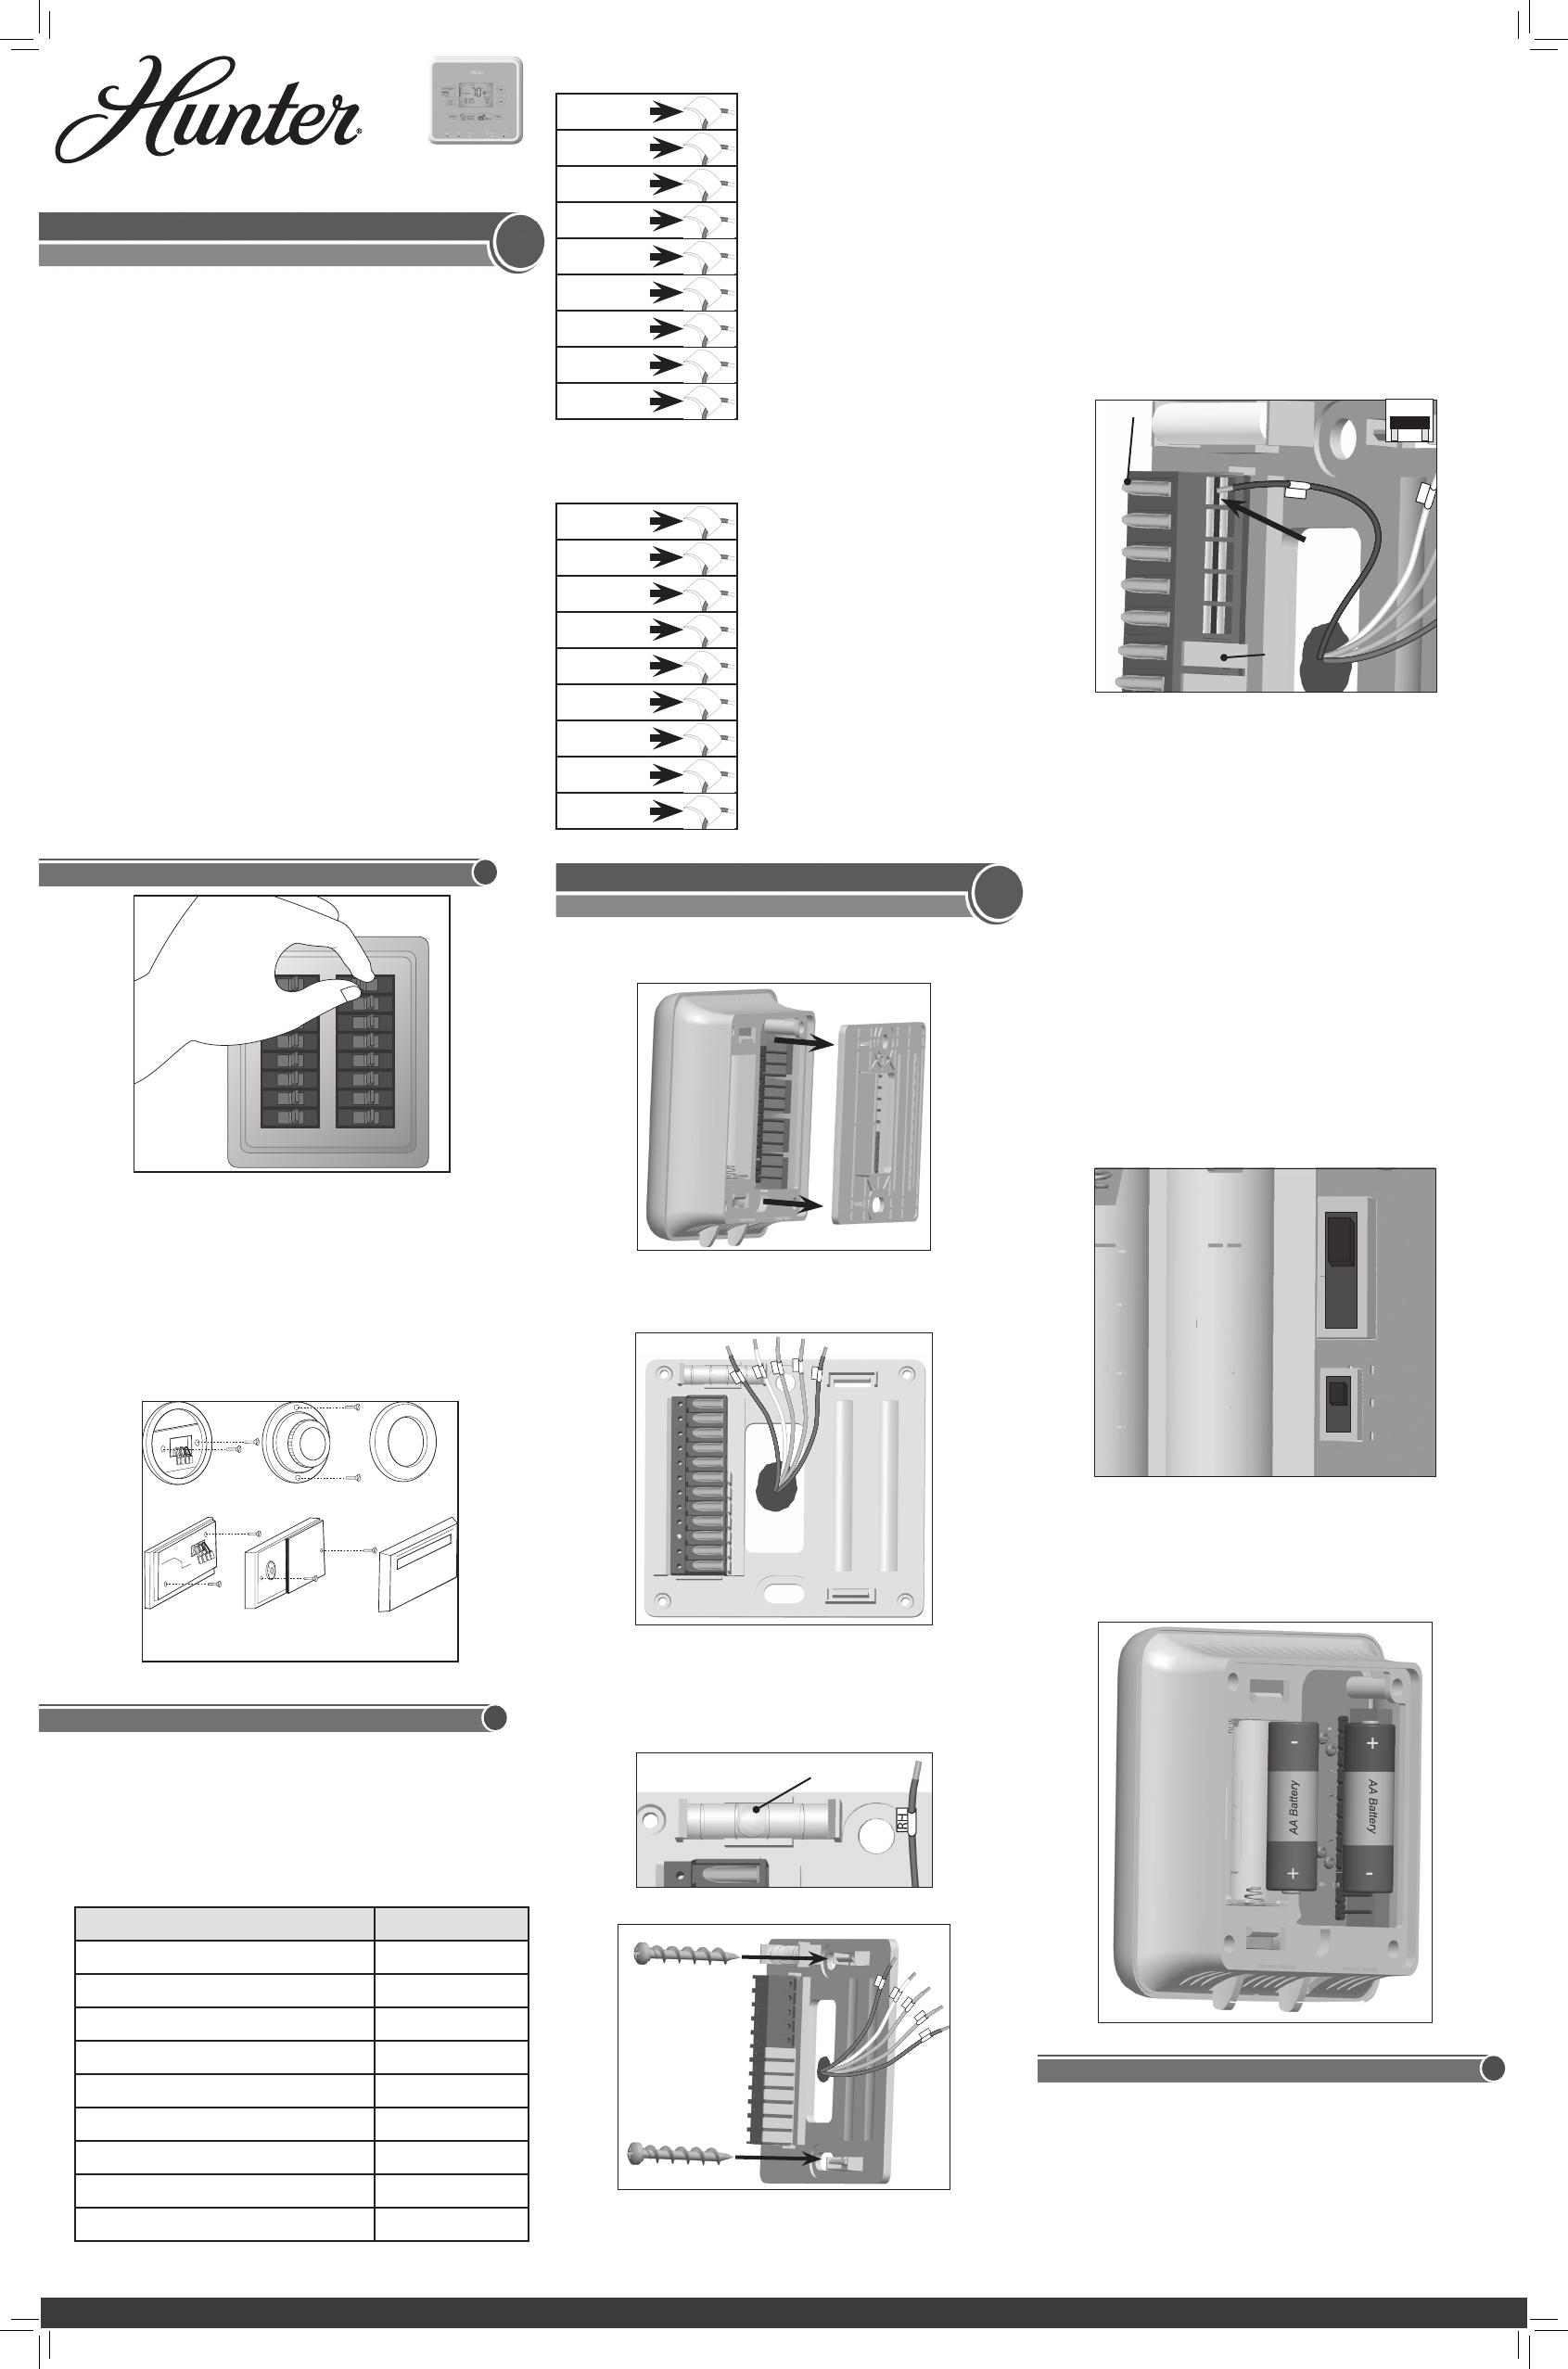 hunter 27183 wiring diagram ow 7508  heat pump wiring diagram further hunter ceiling fan  heat pump wiring diagram further hunter